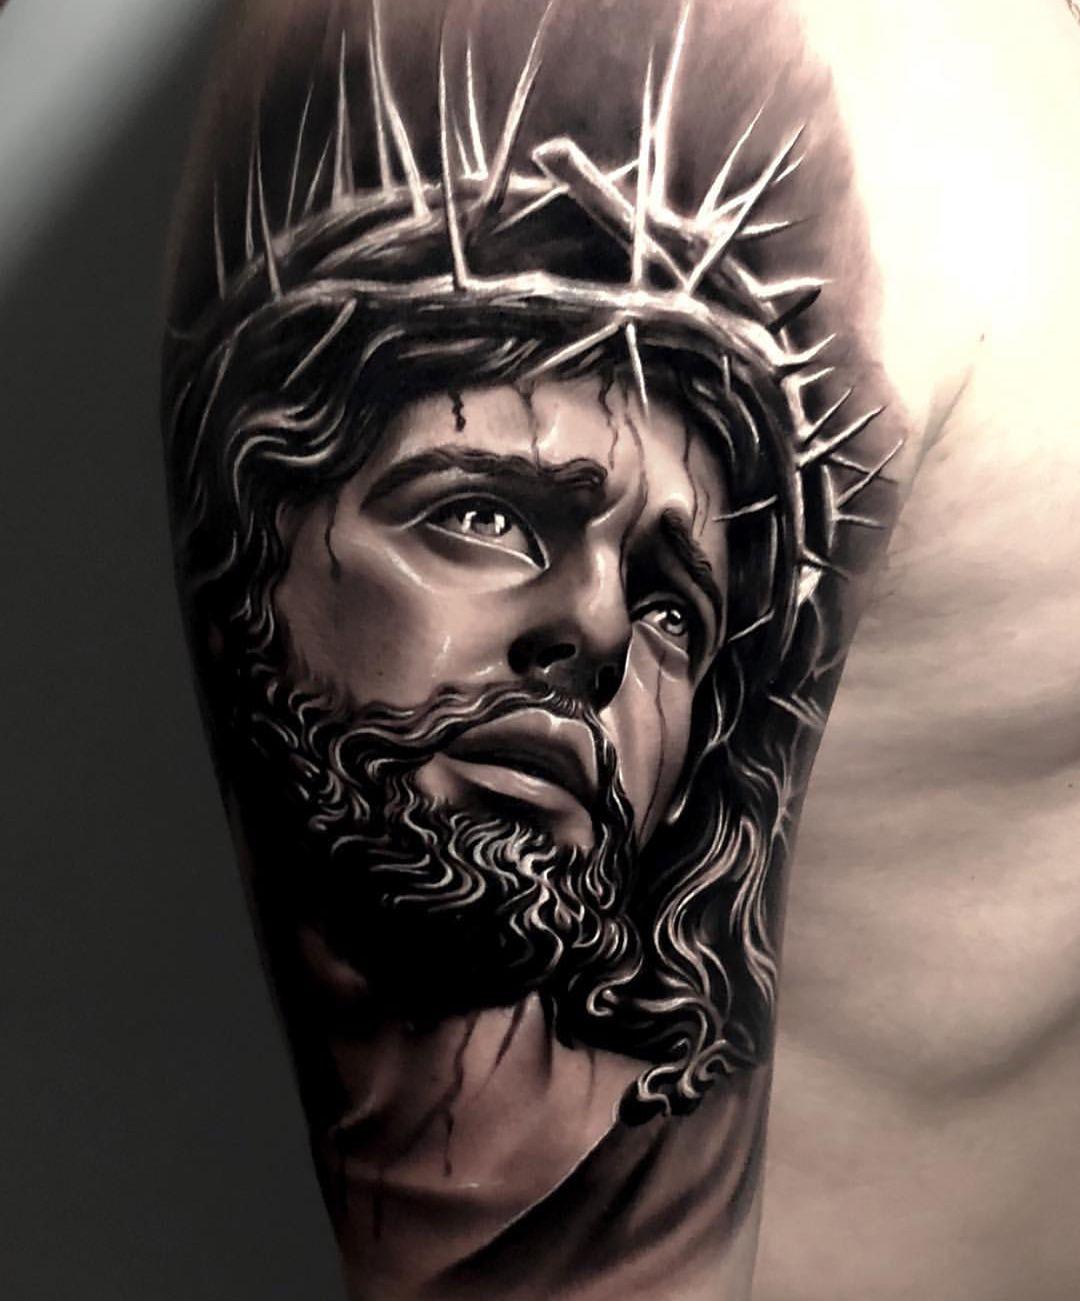 Jesus Tatoos : jesus, tatoos, Lovable, Jesus, Tattoos, Image, Religious, Faith, Tattoo